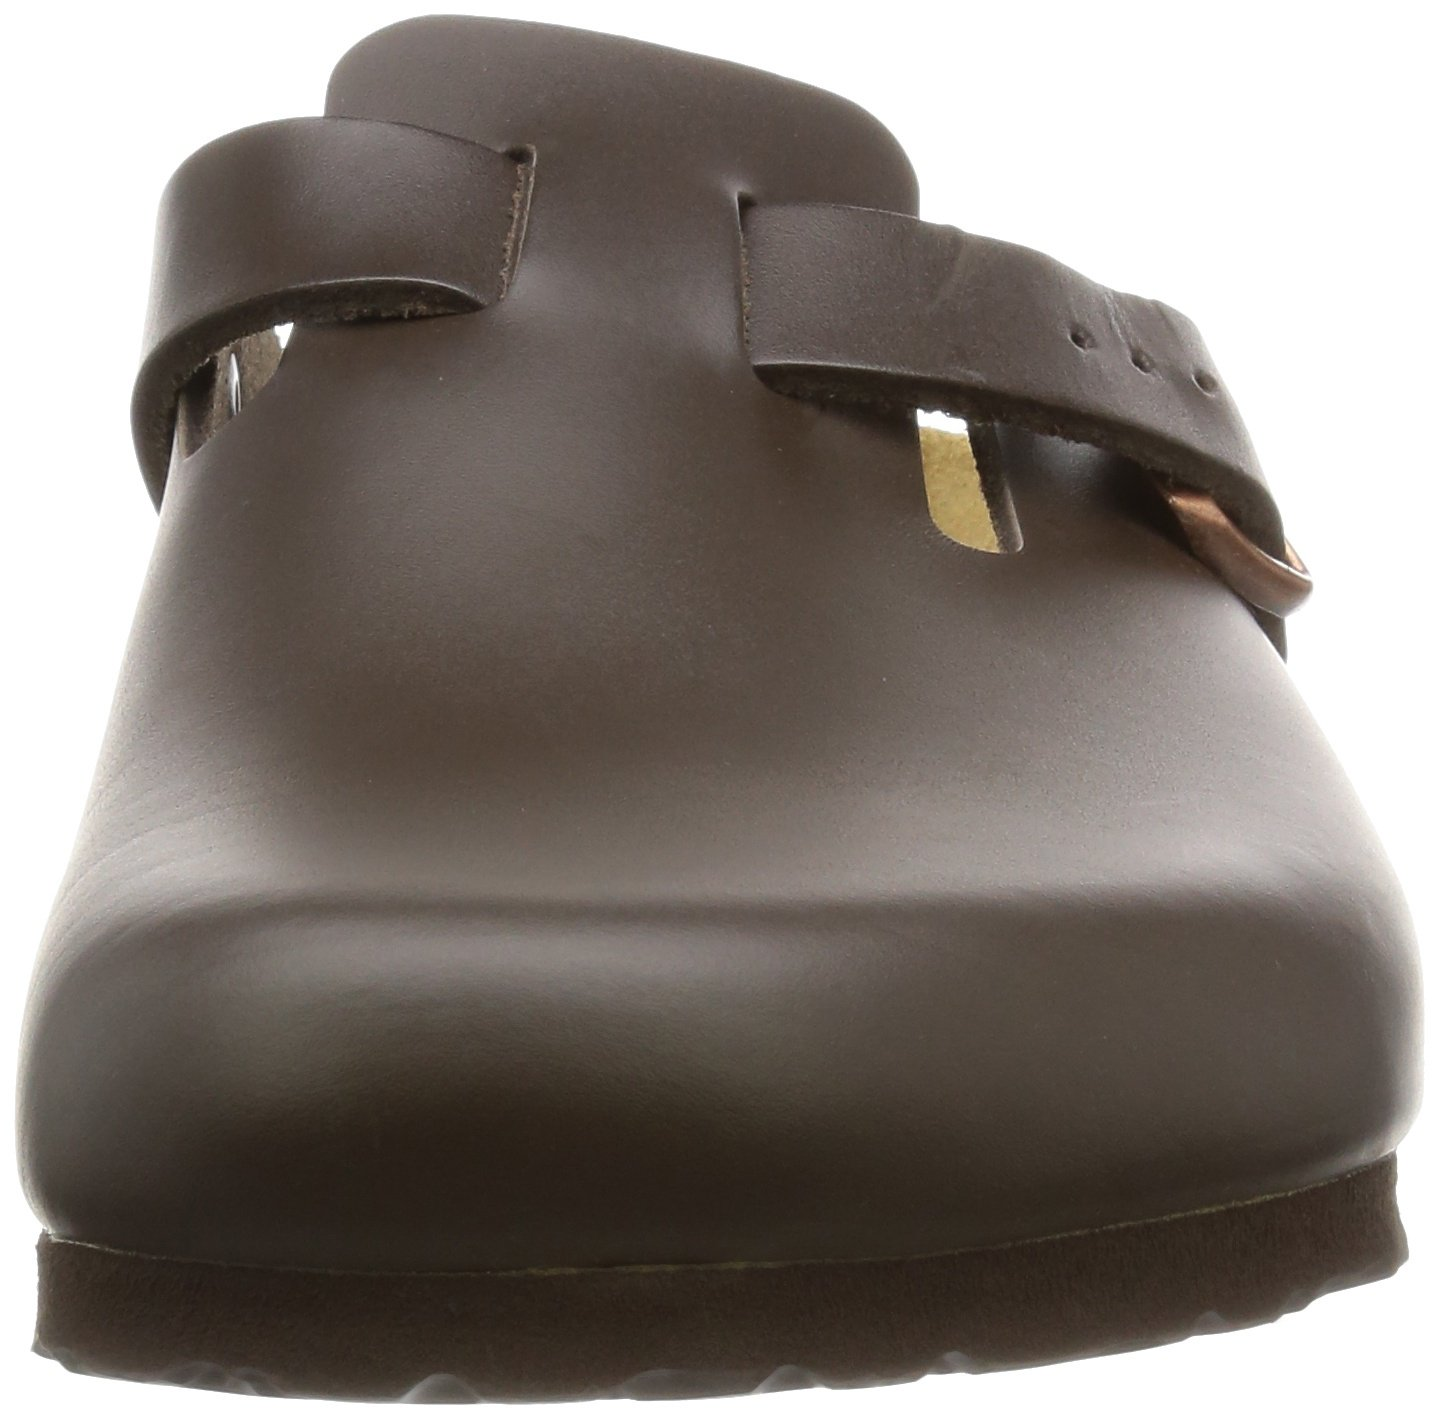 Birkenstock Boston, Unisex Adults' Clogs, Dark Brown Leather,8 UK by Birkenstock (Image #4)